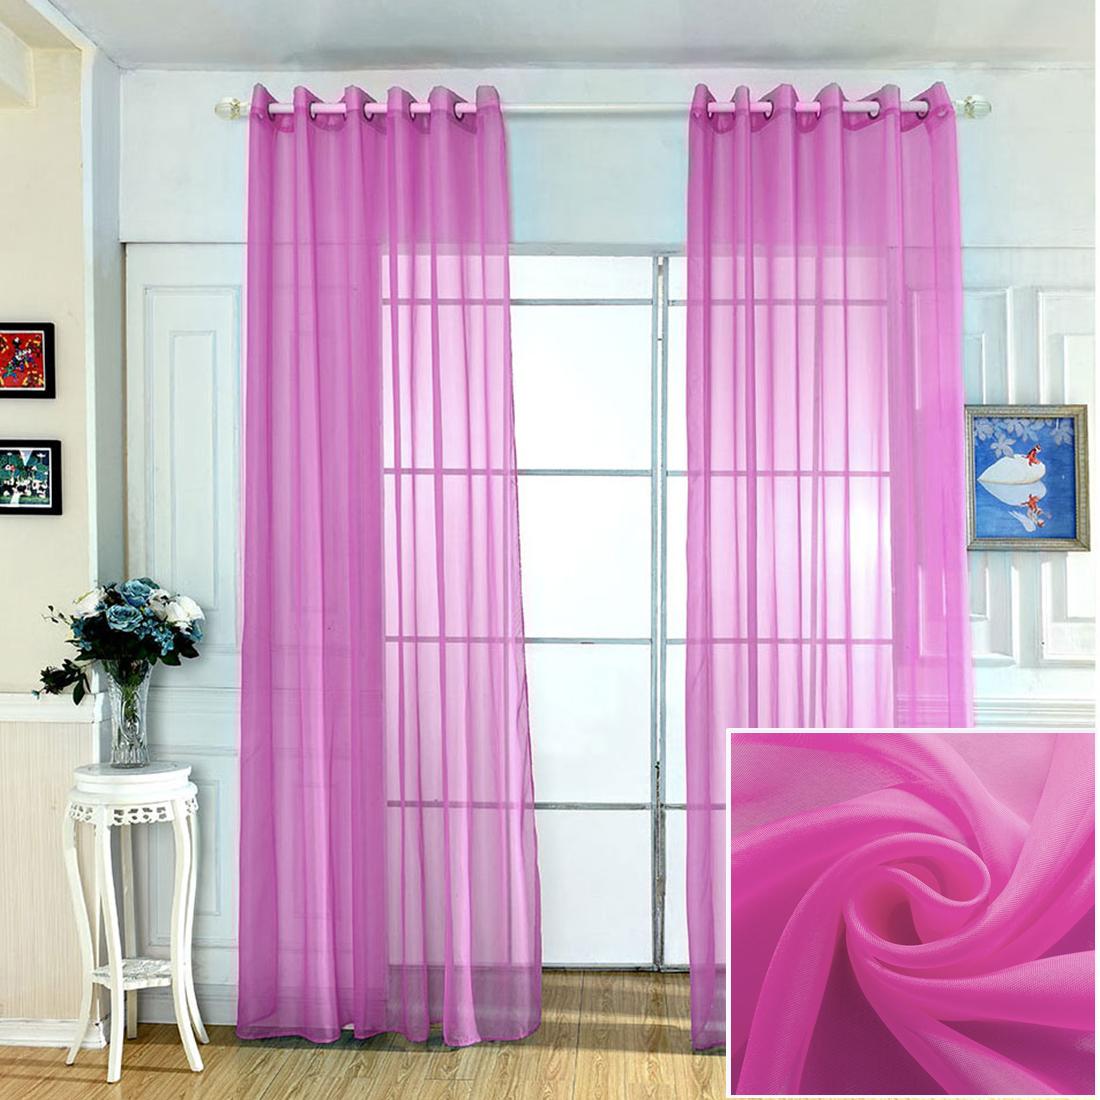 "Solid Window Sheer Voile Curtains Treatment Grommet Drape 39"" X 84""(Each Panel)"